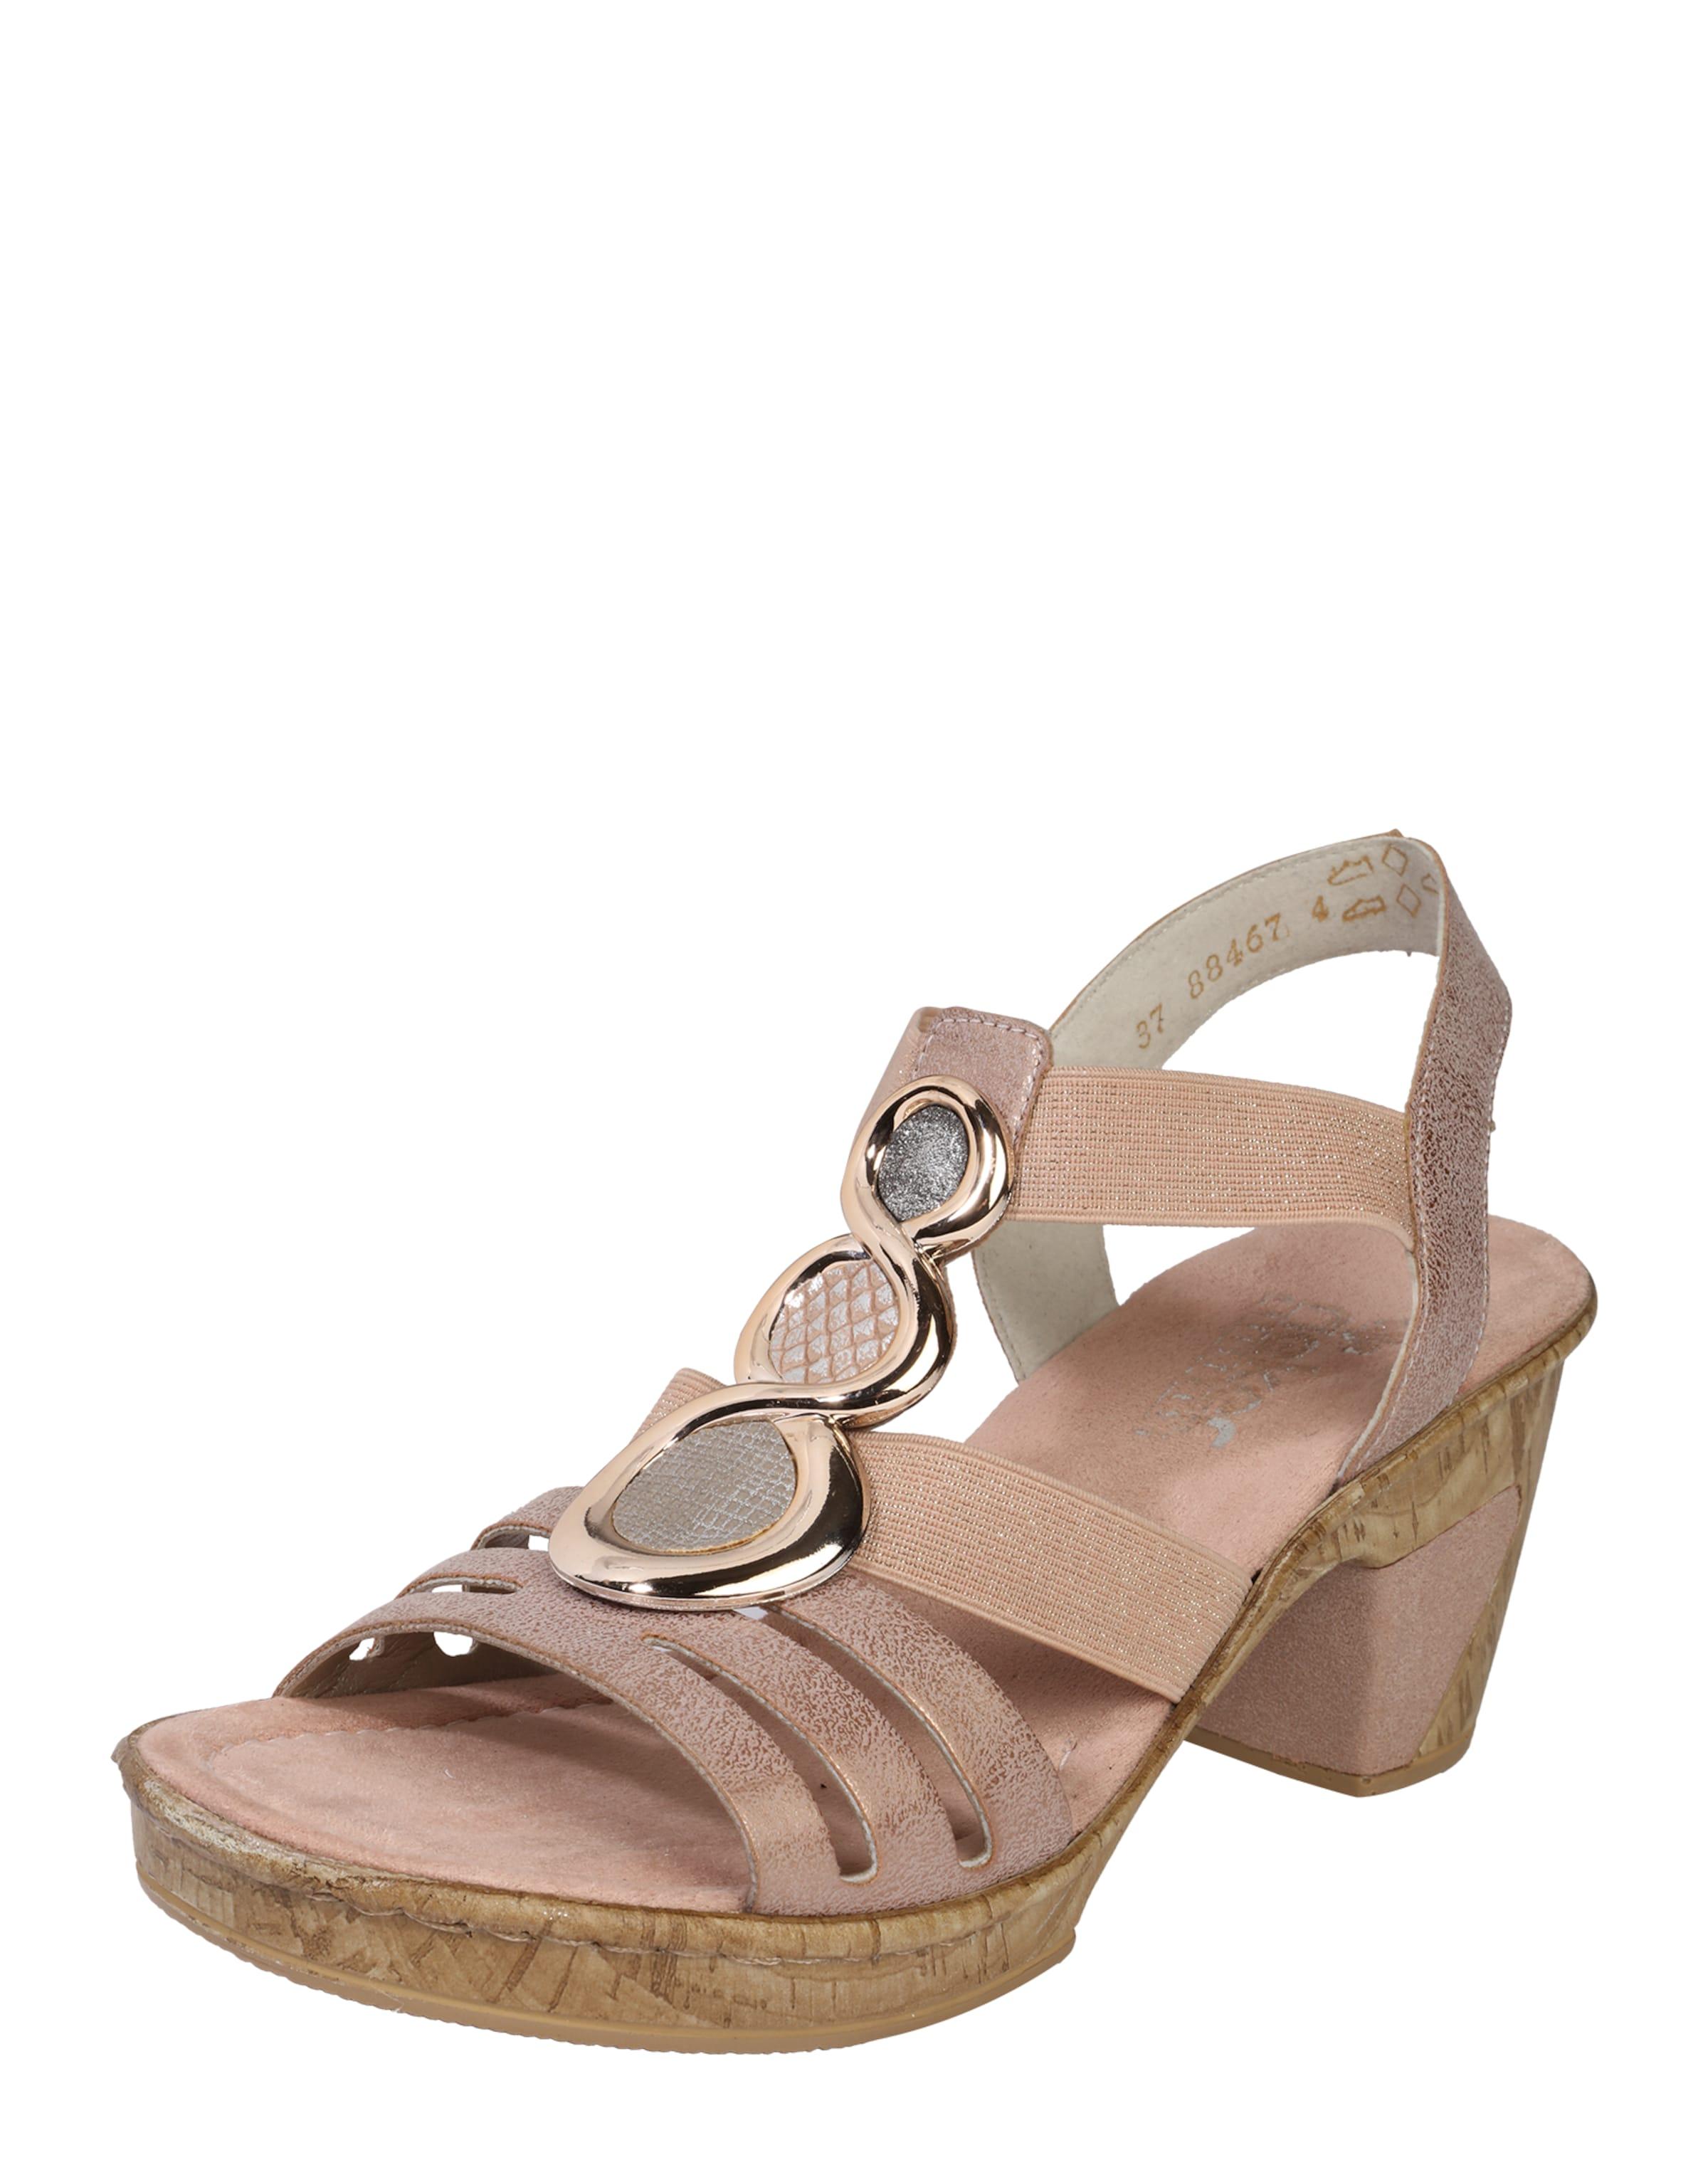 RIEKER 'Sandal stones' mit auffälligem Besatz Rabatt Erwerben Amazon Günstiger Preis Rabatt Billigsten Neu Werden Auslass Hohe Qualität sEcFjuKN